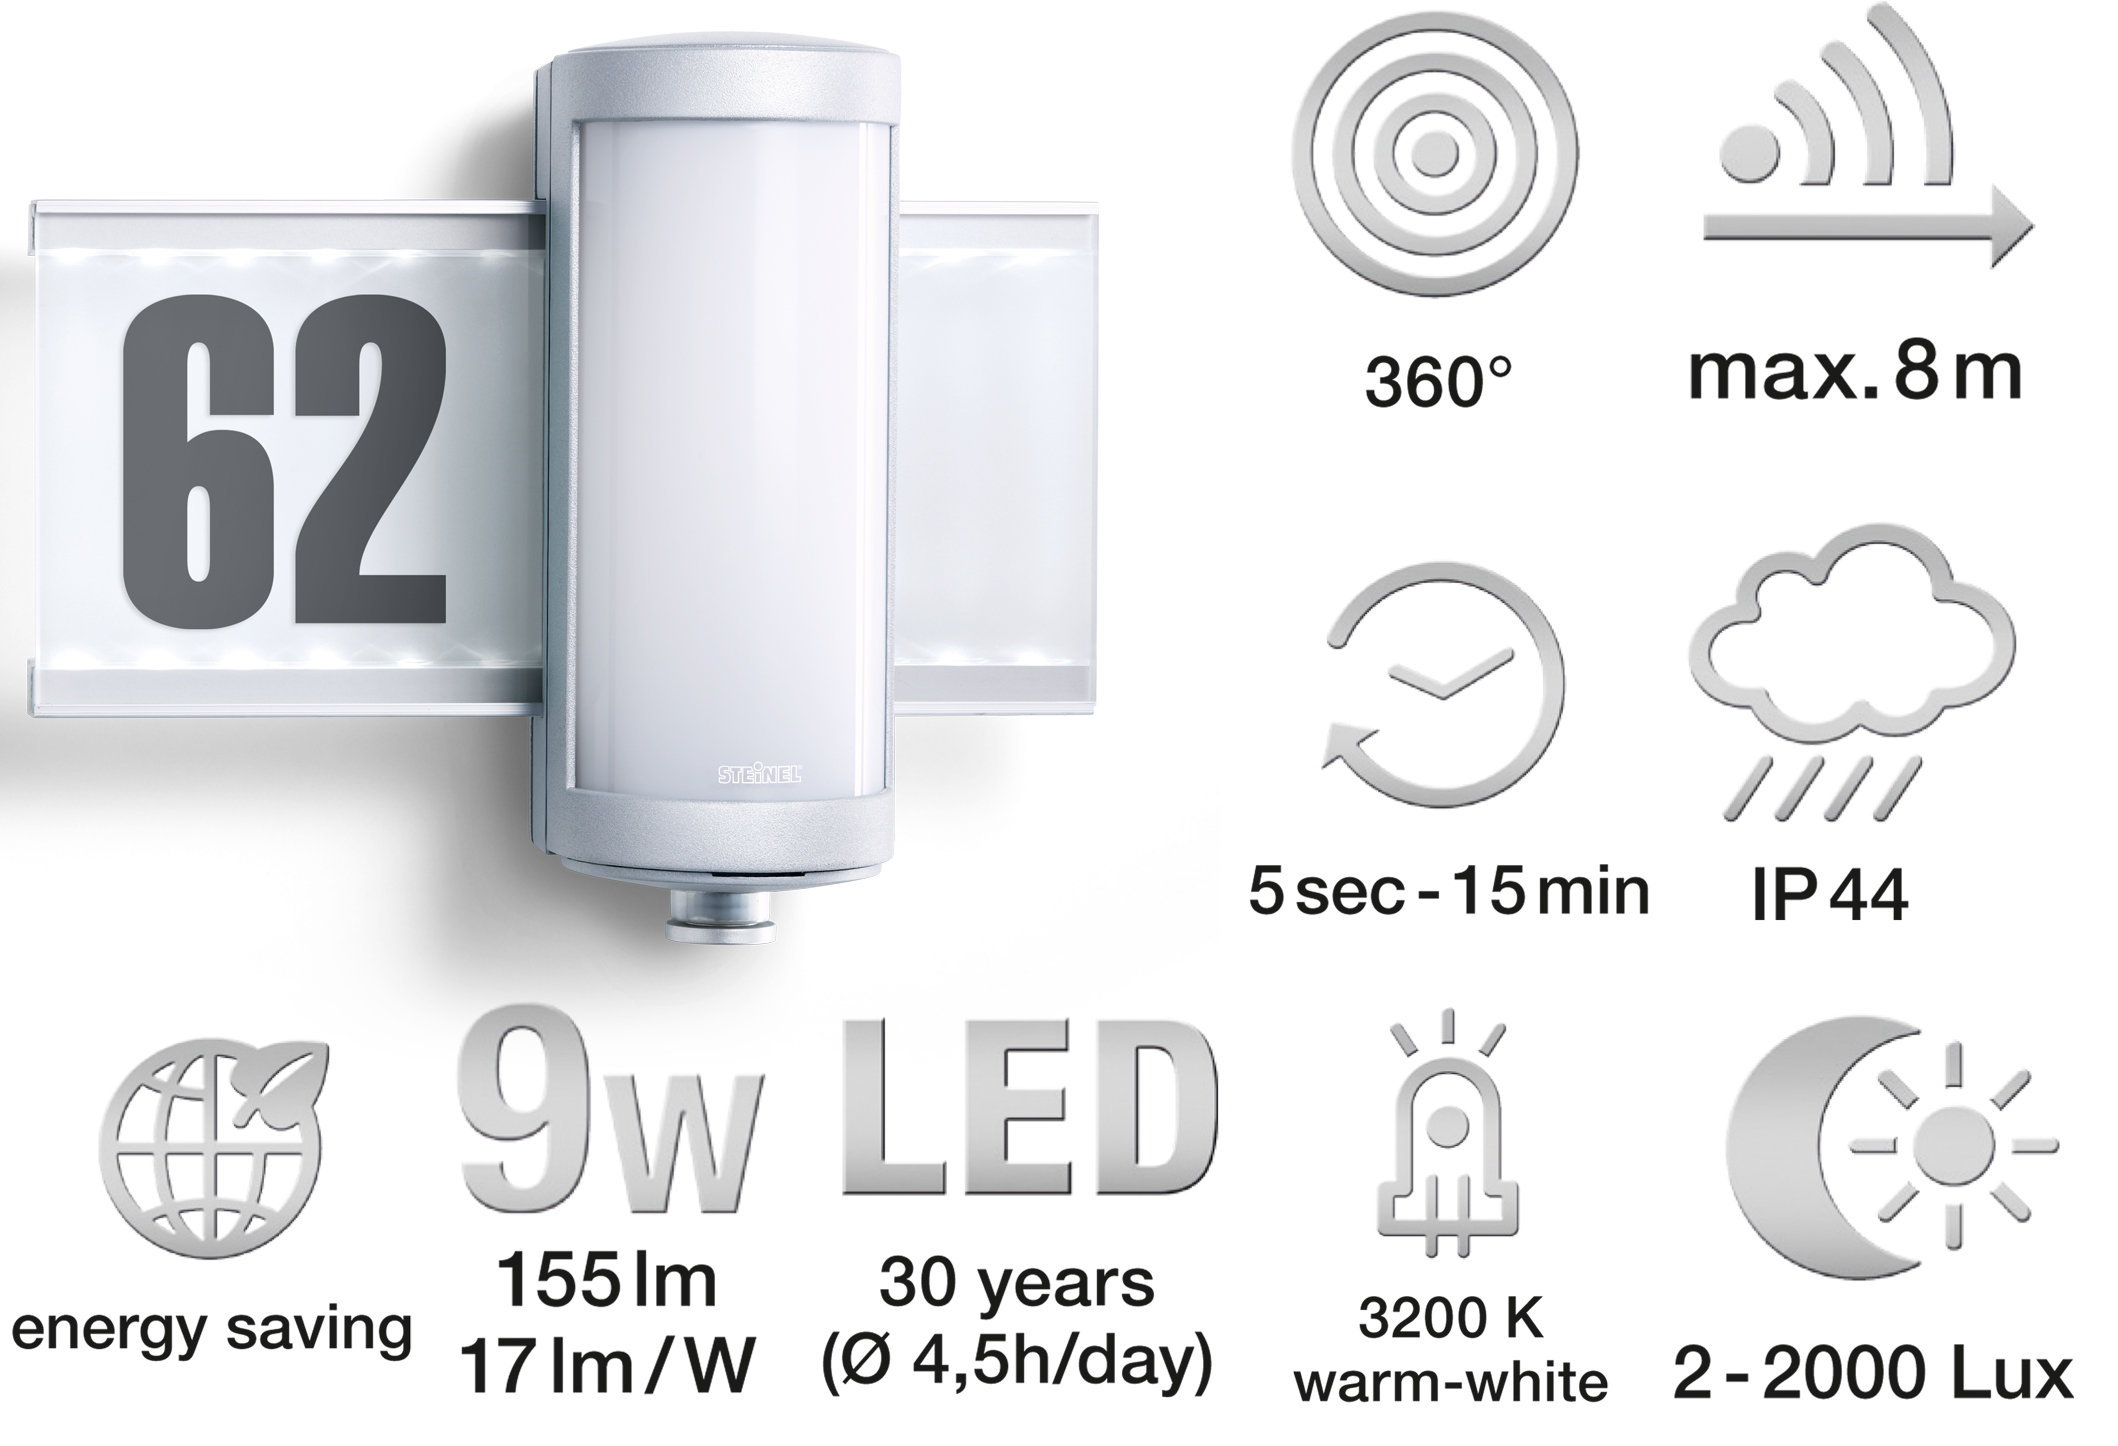 prezentare produs lampa de exterior cu led si senzor miscare steinel poza 19. Black Bedroom Furniture Sets. Home Design Ideas